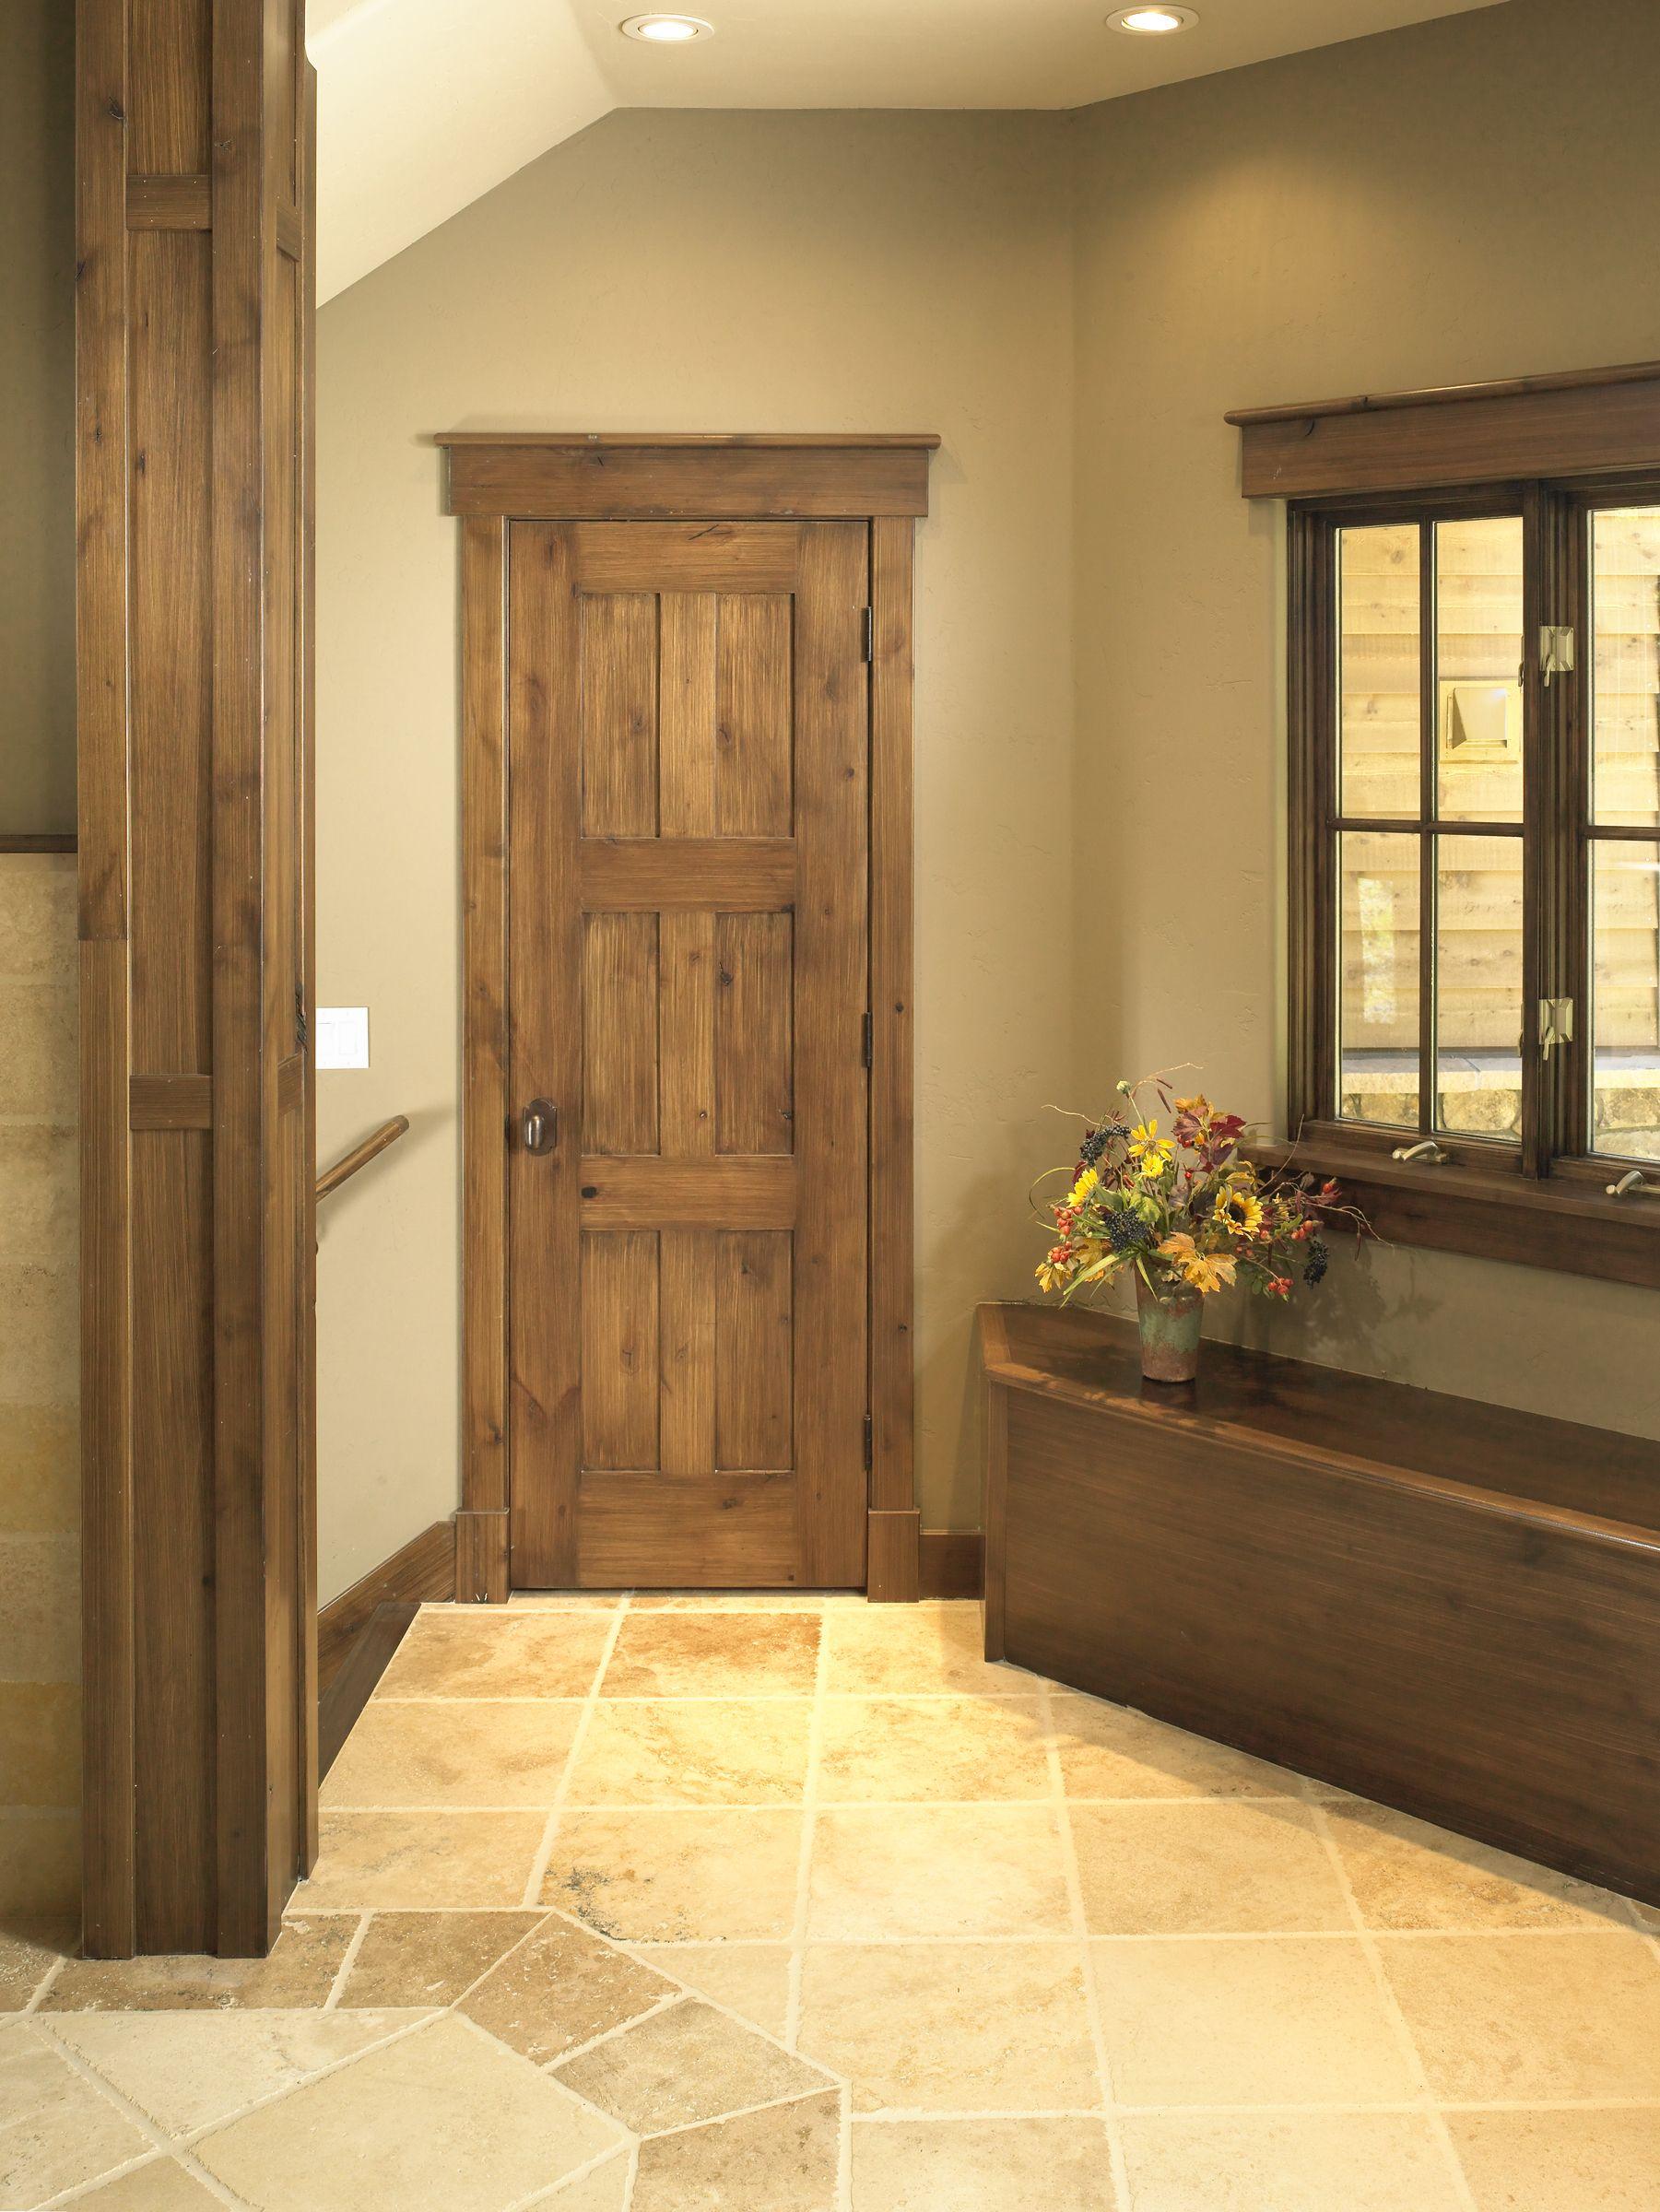 Rustic Craftsman Interior Closet Door Square Top Rail 6 Panel A1 Knotty Alder Yampa River